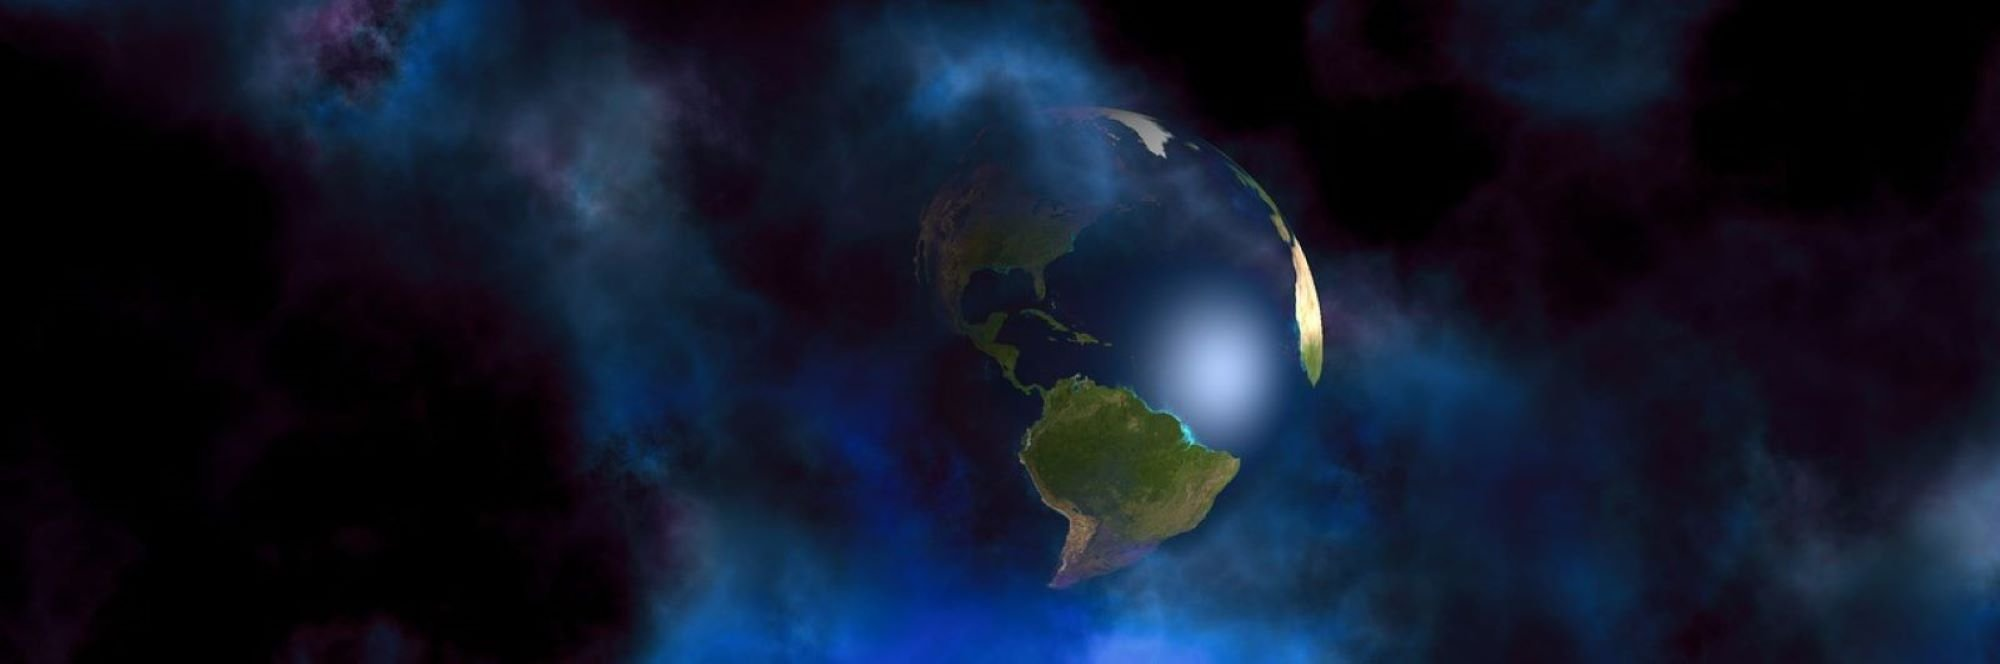 la tierra la historia del planeta azul i222266